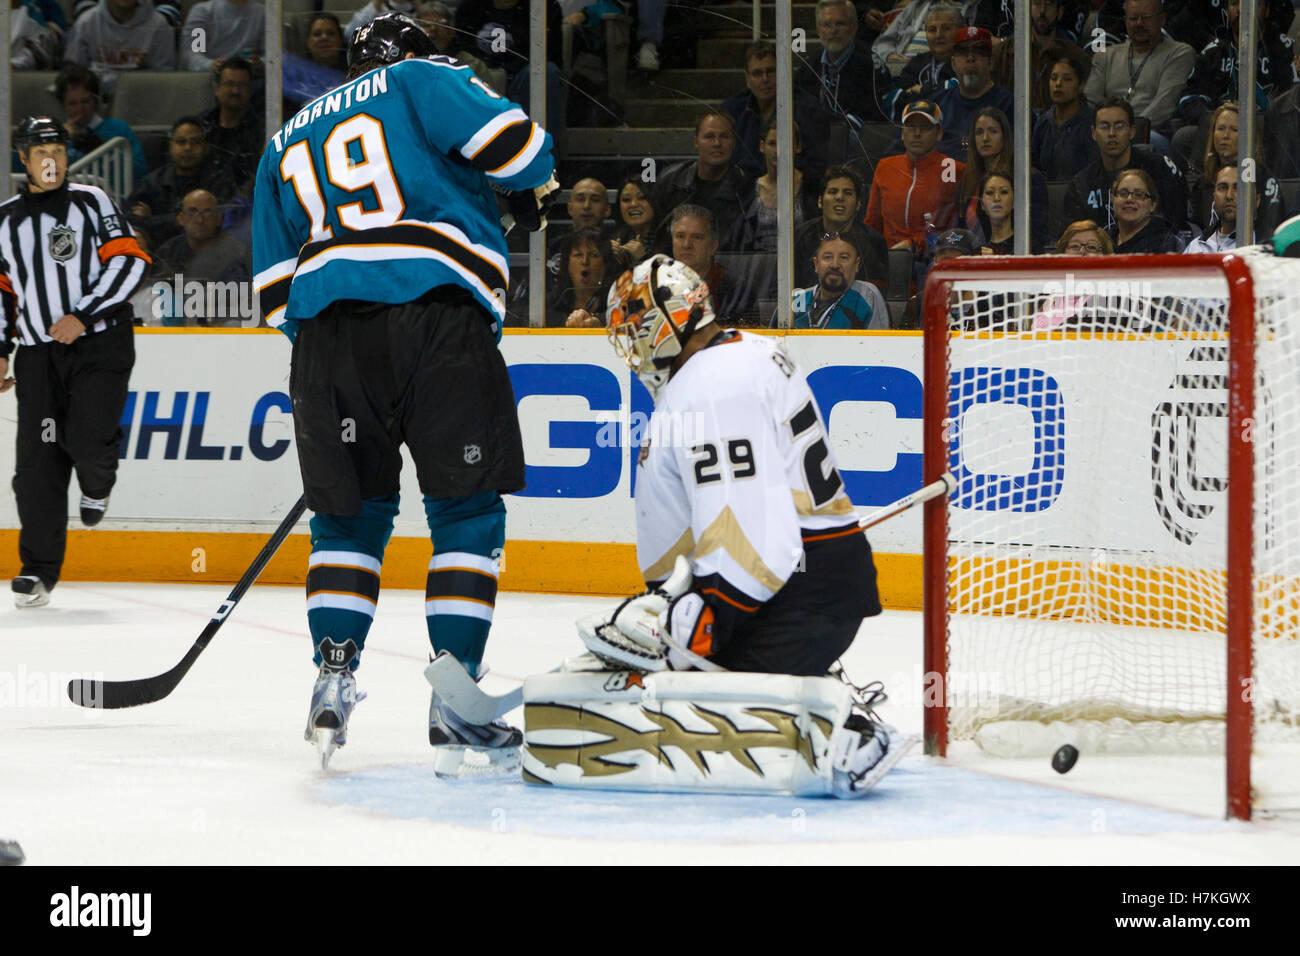 April 2, 2011; San Jose, CA, USA;  San Jose Sharks right wing Devin Setoguchi (not pictured) scores a goal as center - Stock Image